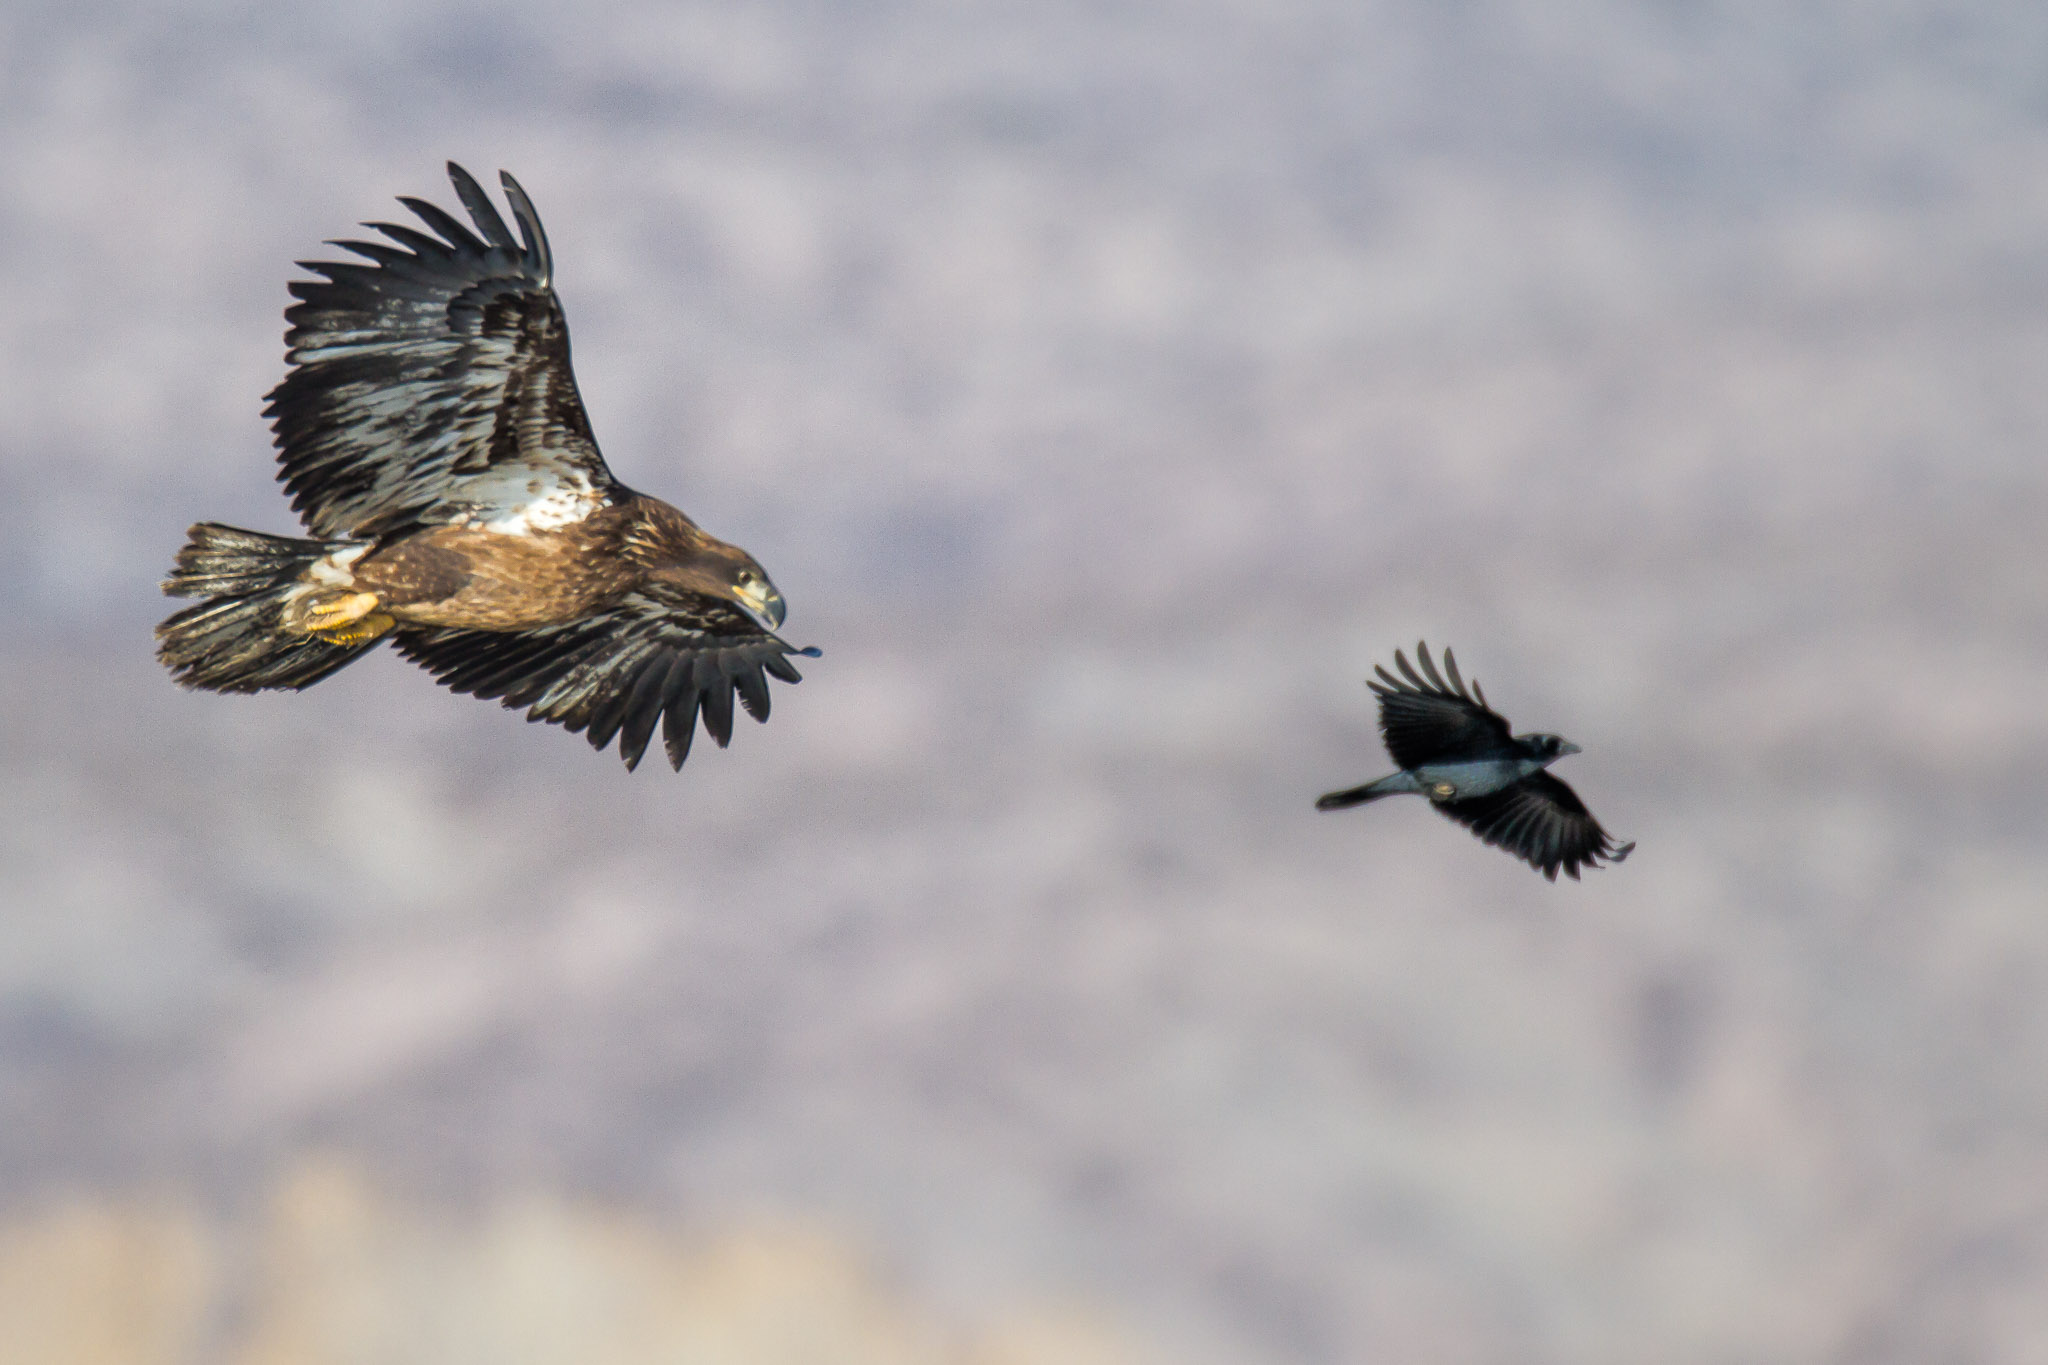 20120207_eagle_7710.jpg